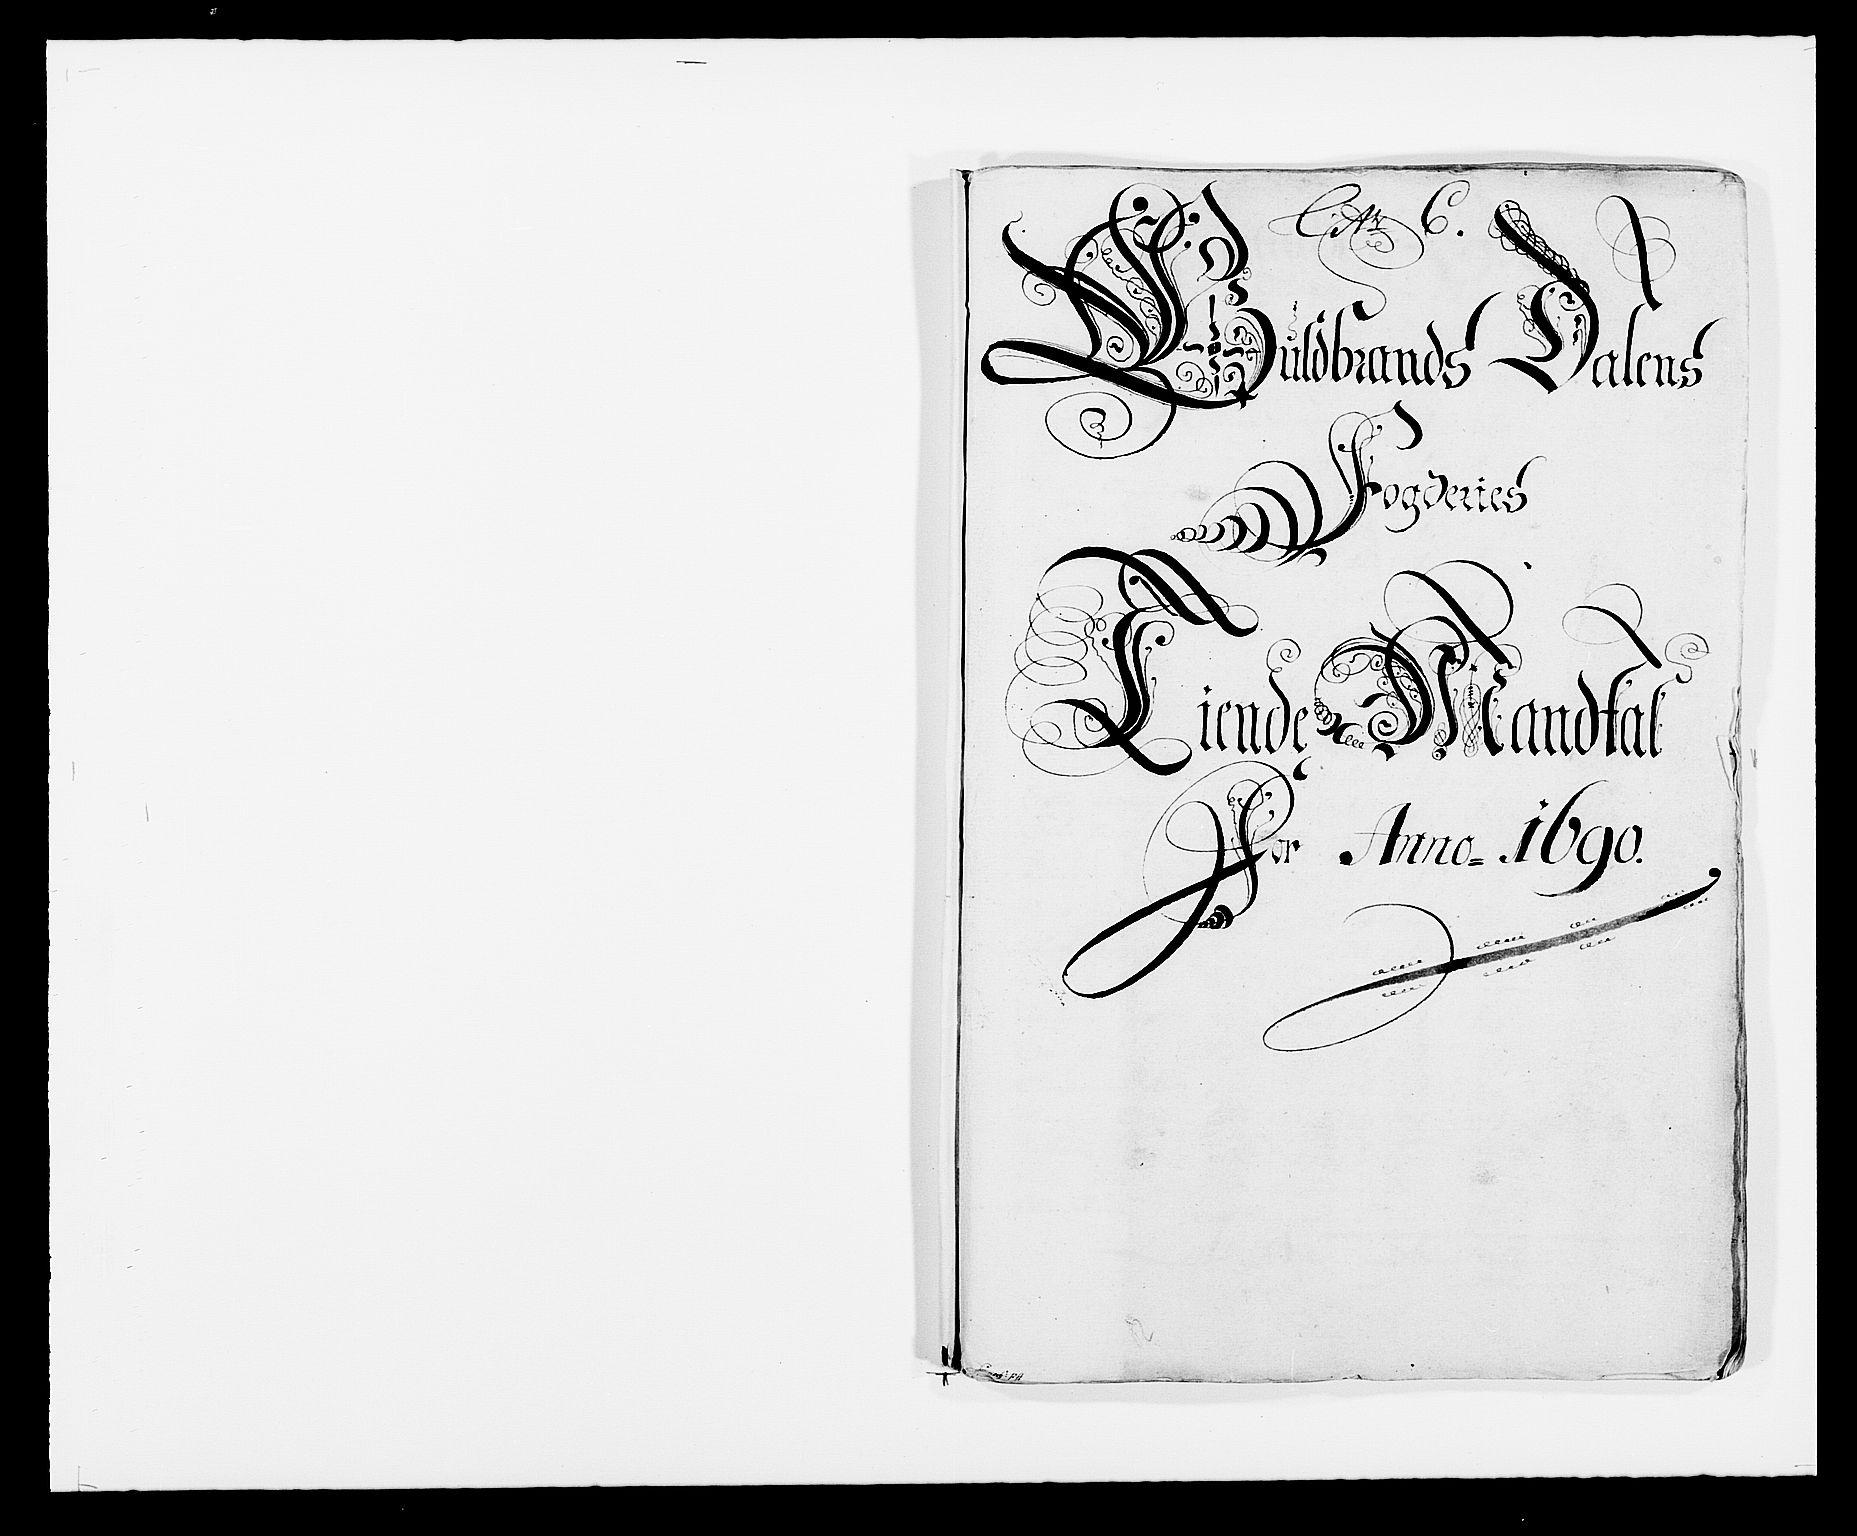 RA, Rentekammeret inntil 1814, Reviderte regnskaper, Fogderegnskap, R17/L1165: Fogderegnskap Gudbrandsdal, 1690-1692, s. 50